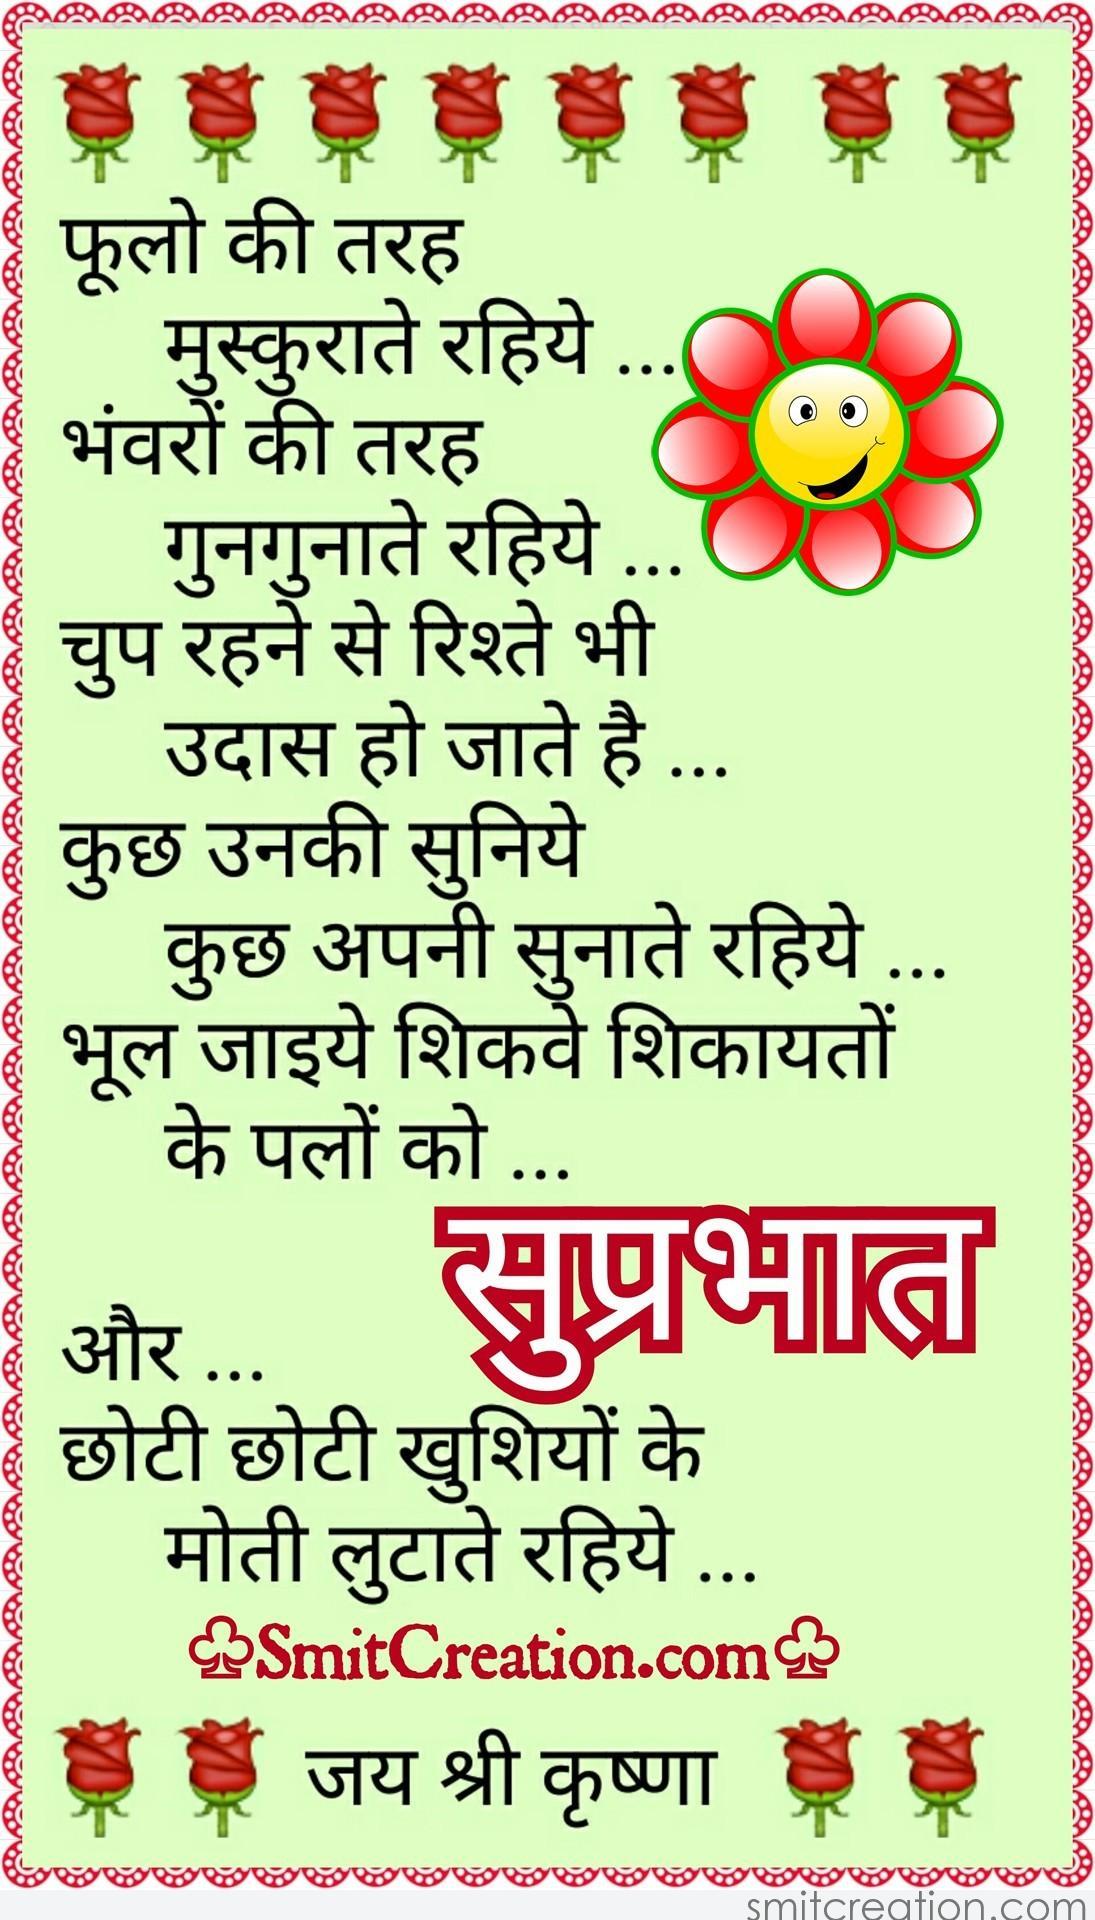 Best Gujarati Quotes Wallpaper Shubh Prabhat Shayari Pictures And Graphics Smitcreation